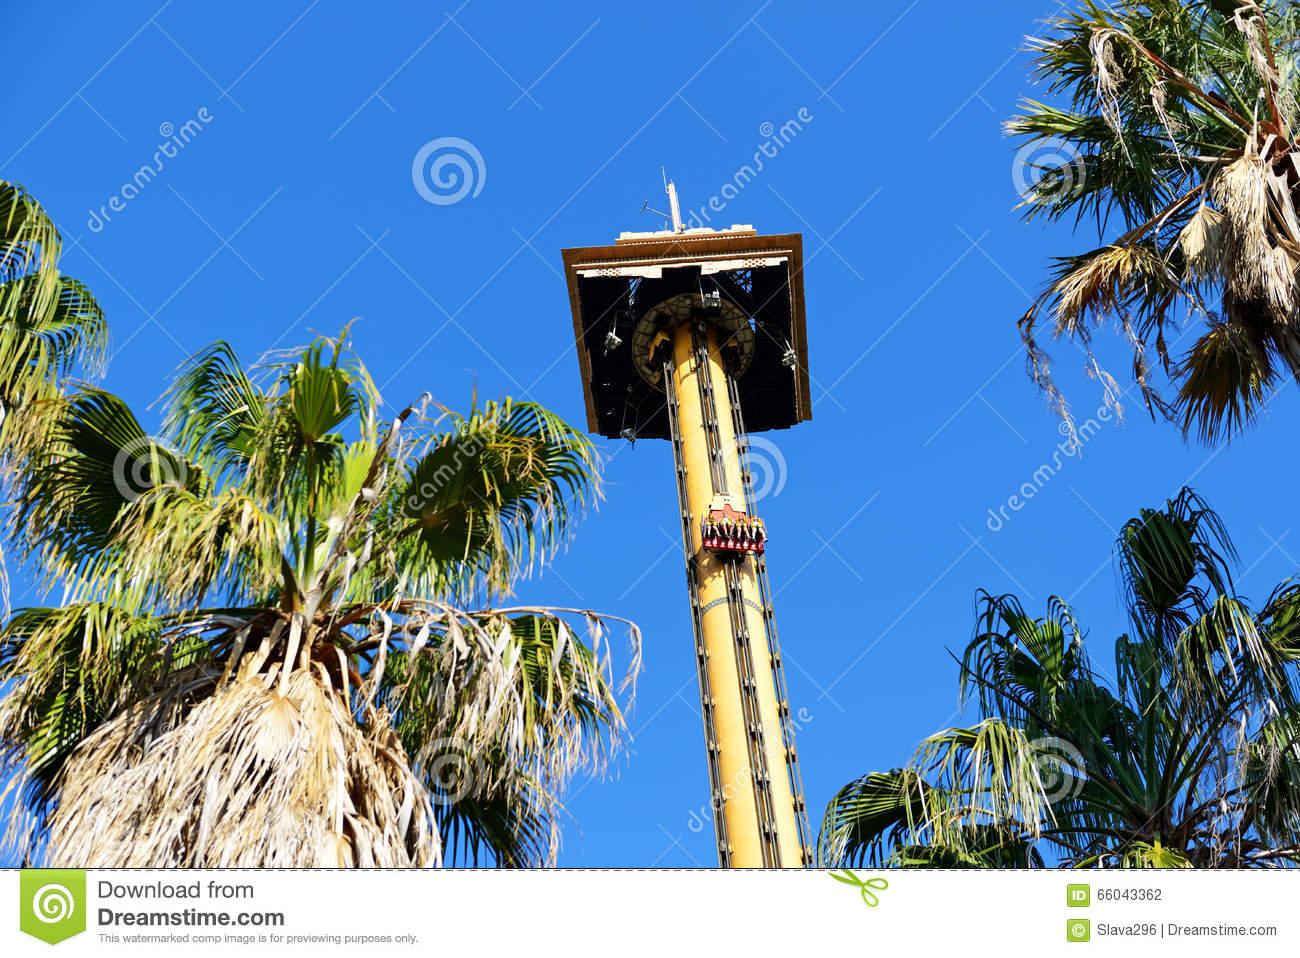 The Hurakan Condor Ride In Port Aventura Theme Park Stock Photo.